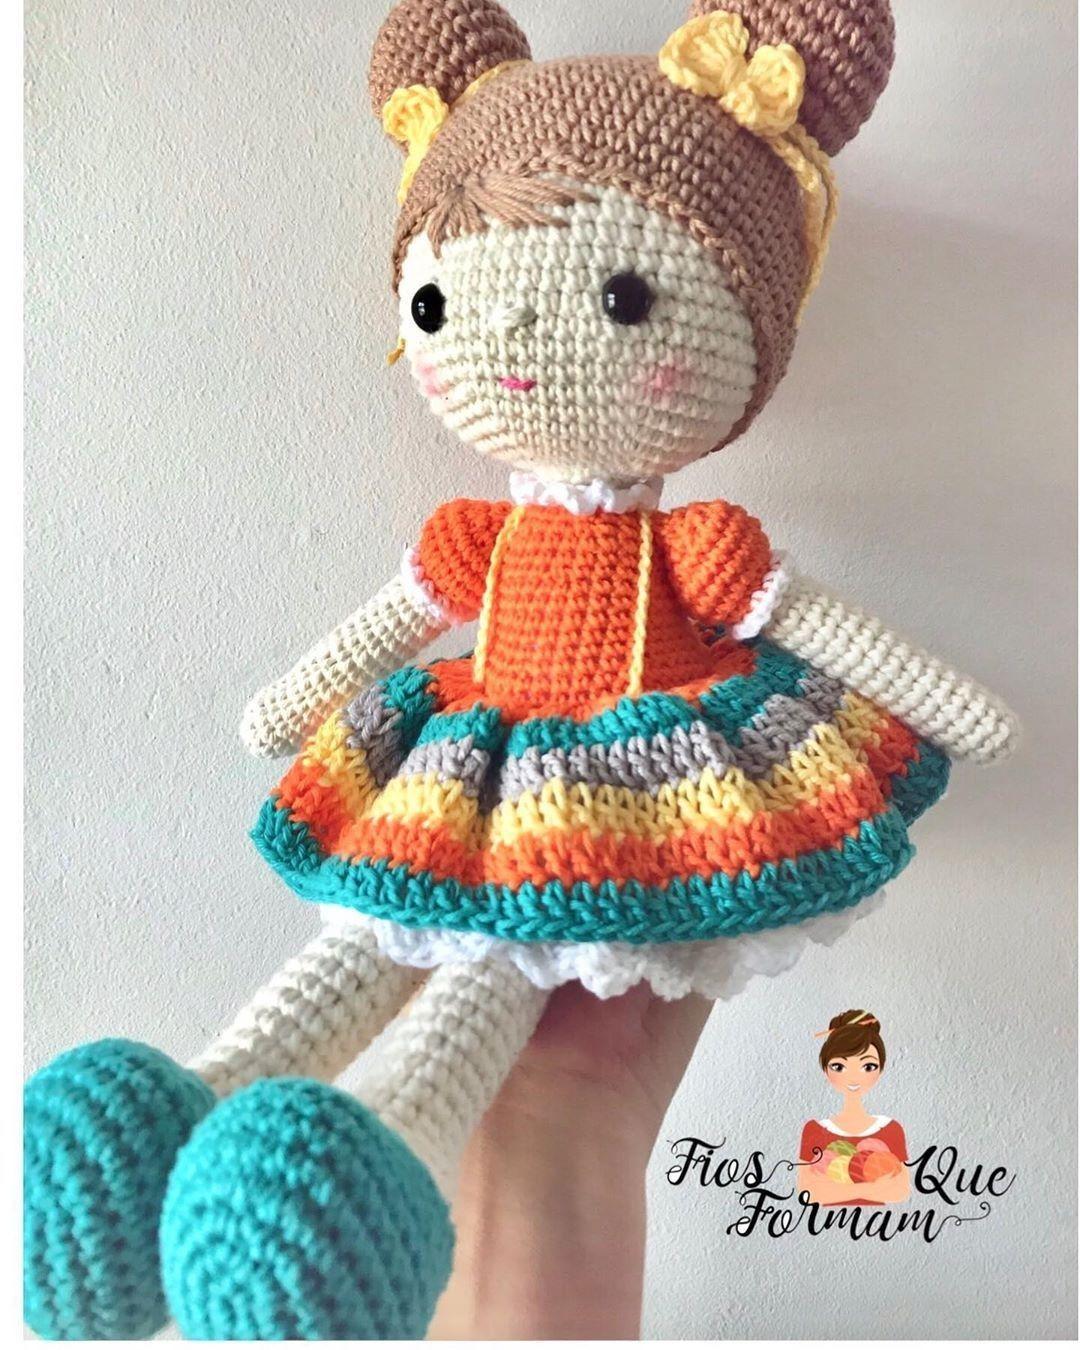 Apostilas Amigurumi animais de crochê gratis #amigurumireceita ... | 1350x1080